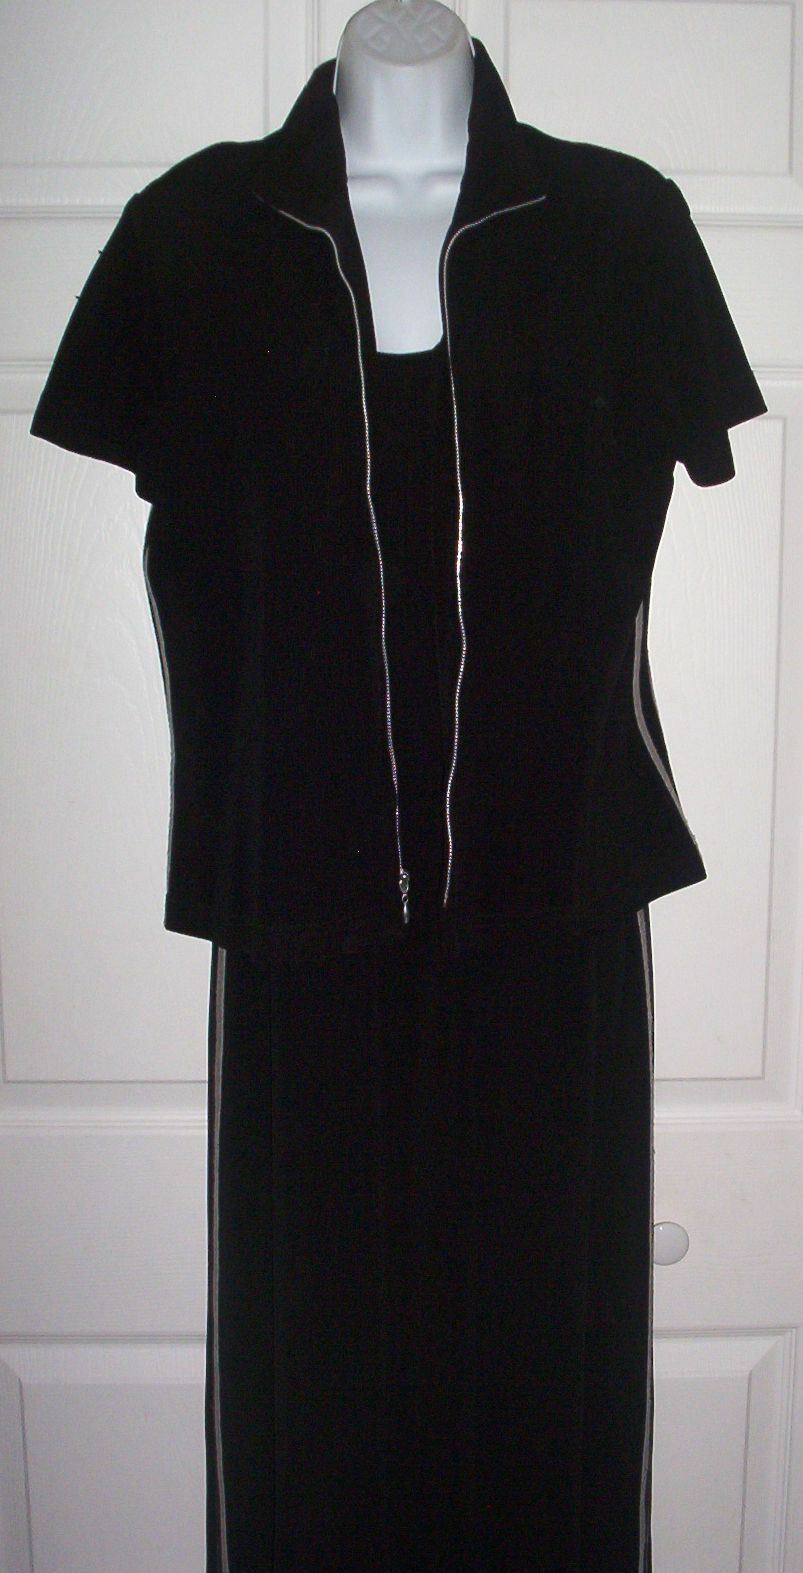 Woherren Athletic Themed 3 Piece Set Größe 10 Dress Jacket & Pants schwarz & grau